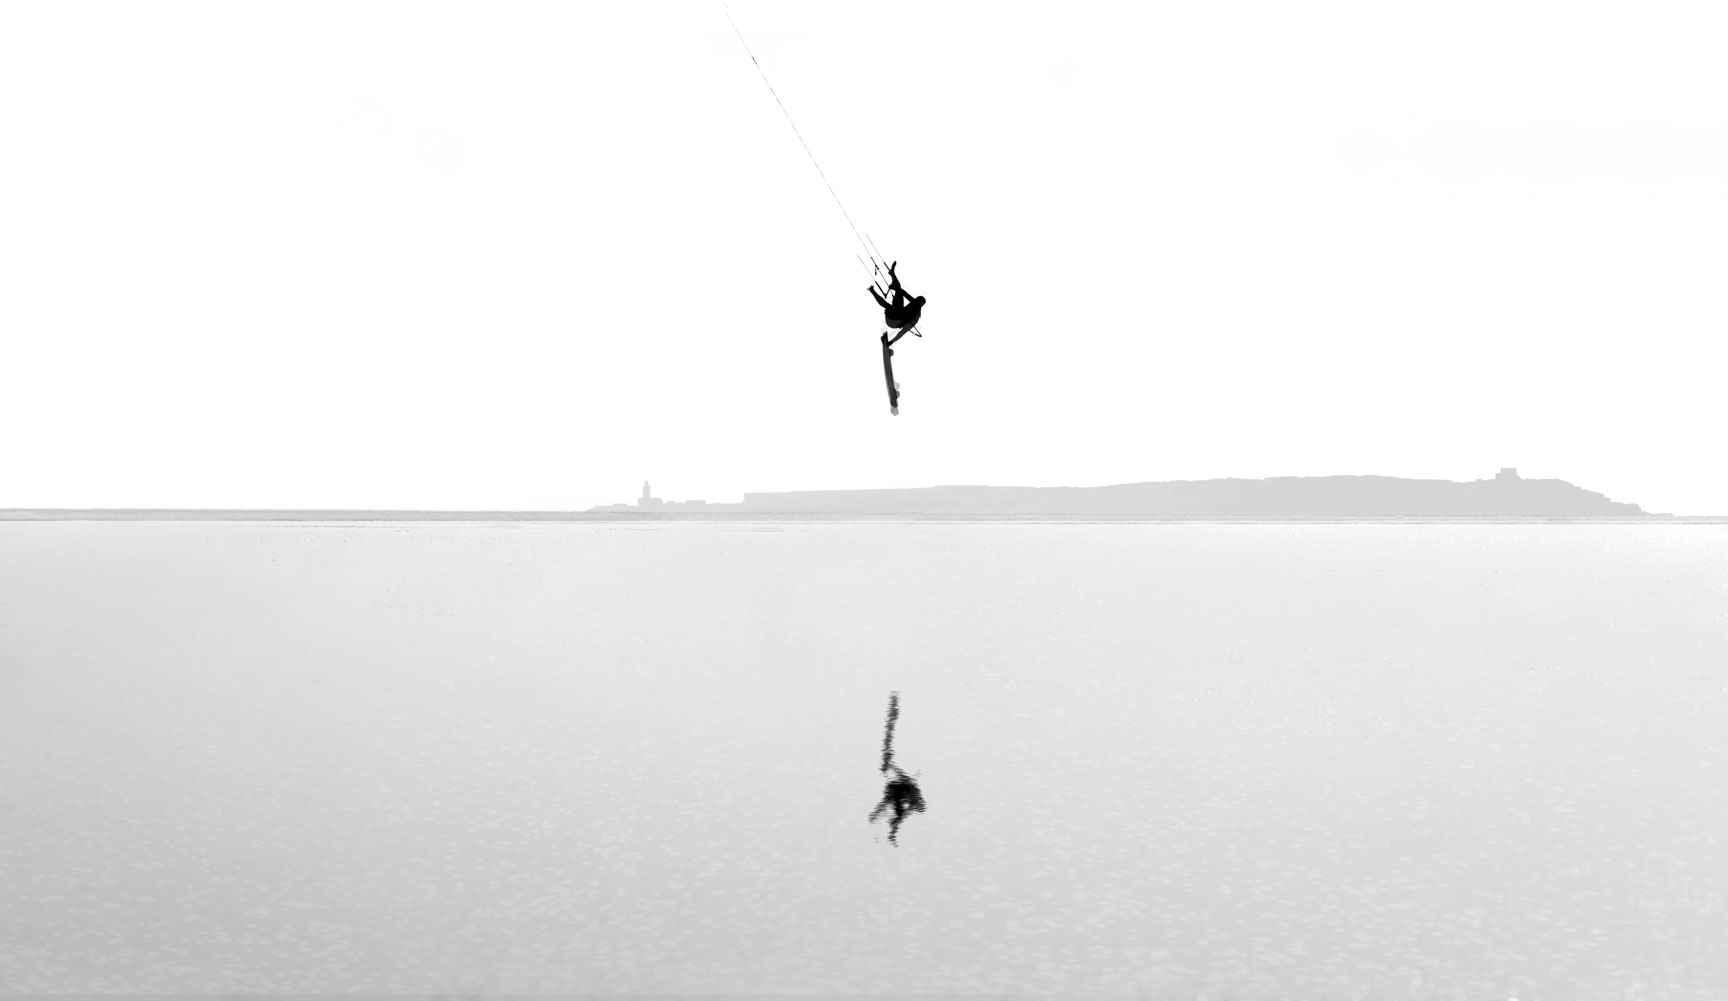 Kite spot